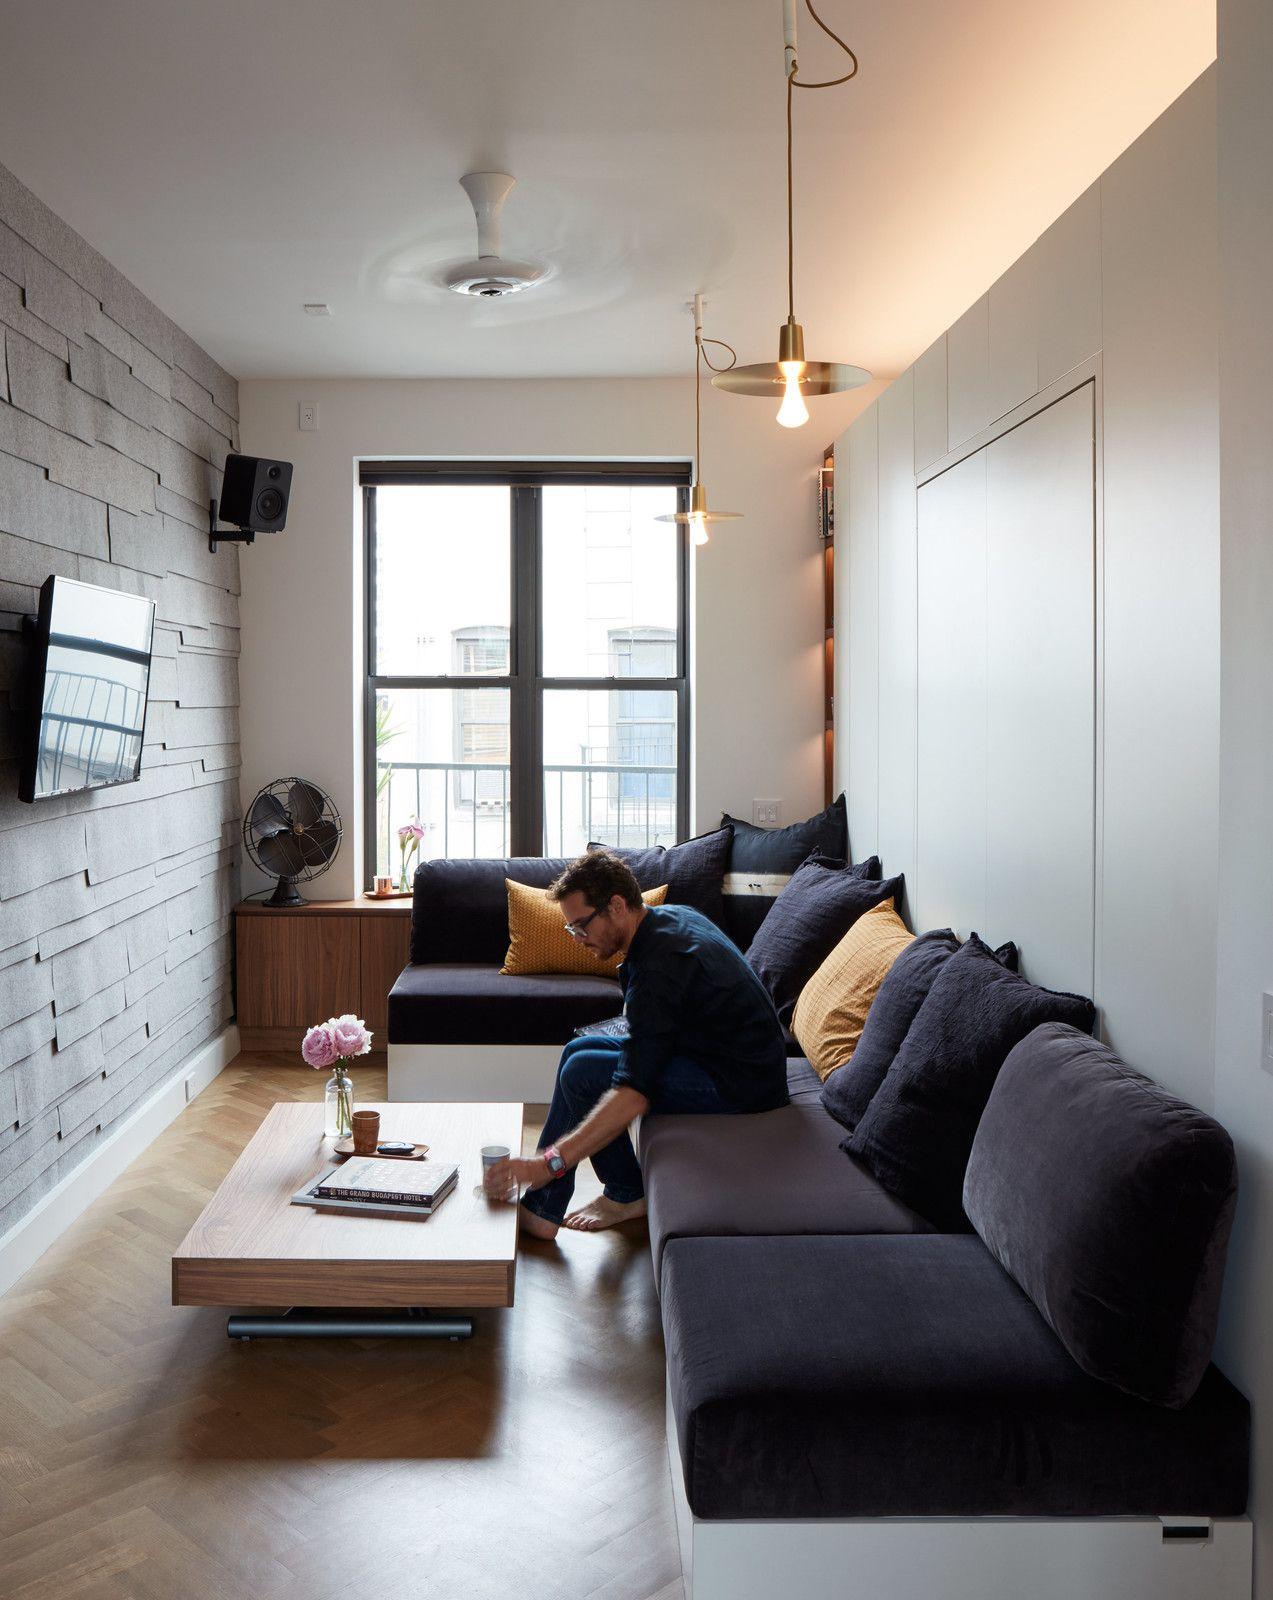 Living Room Ideas Modern Small